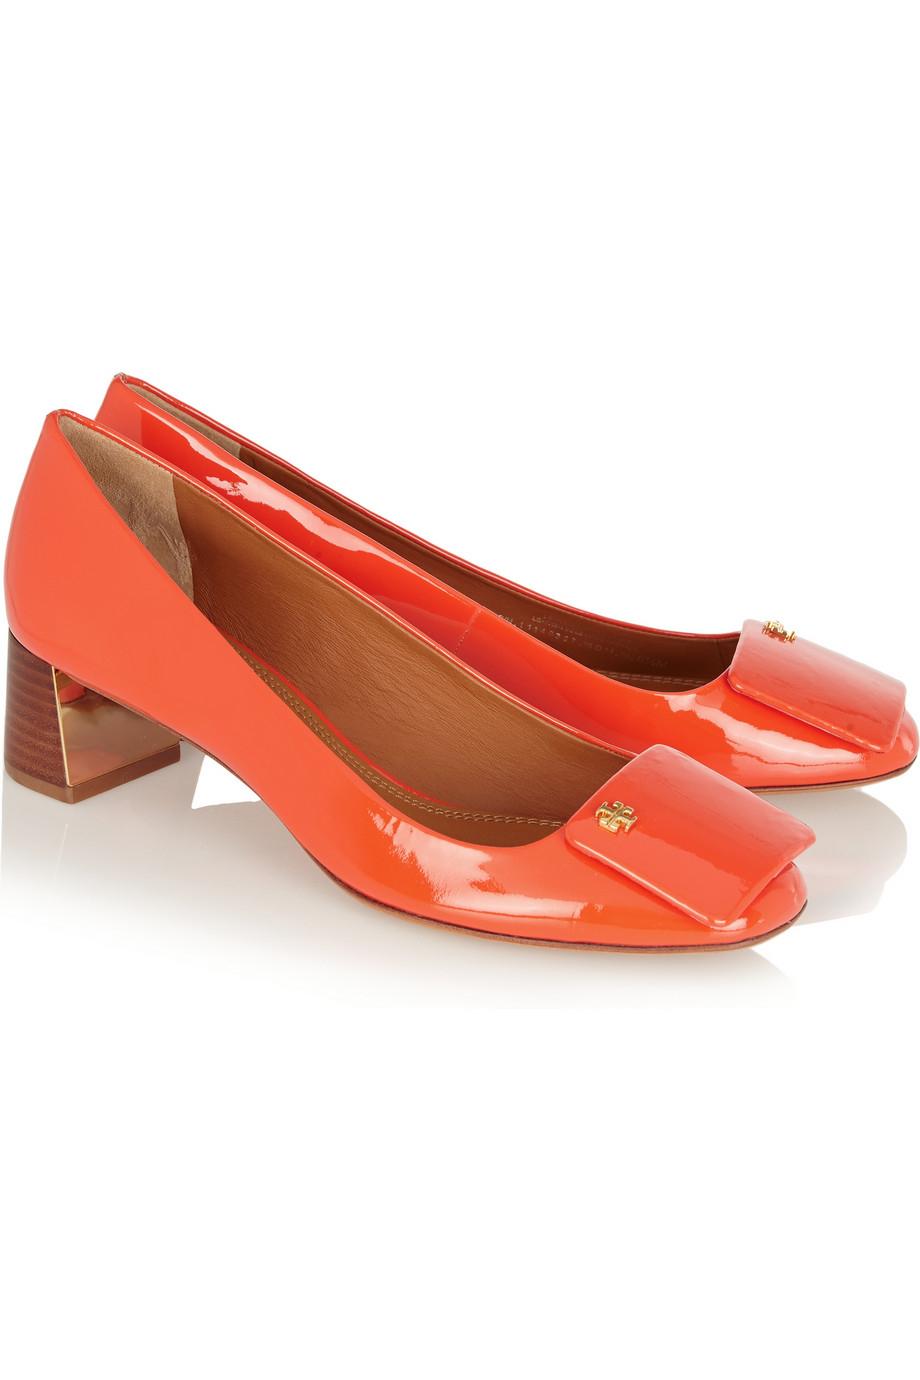 8a7094b8715fe Tory Burch Yardley Patent-leather Pumps in Orange - Lyst